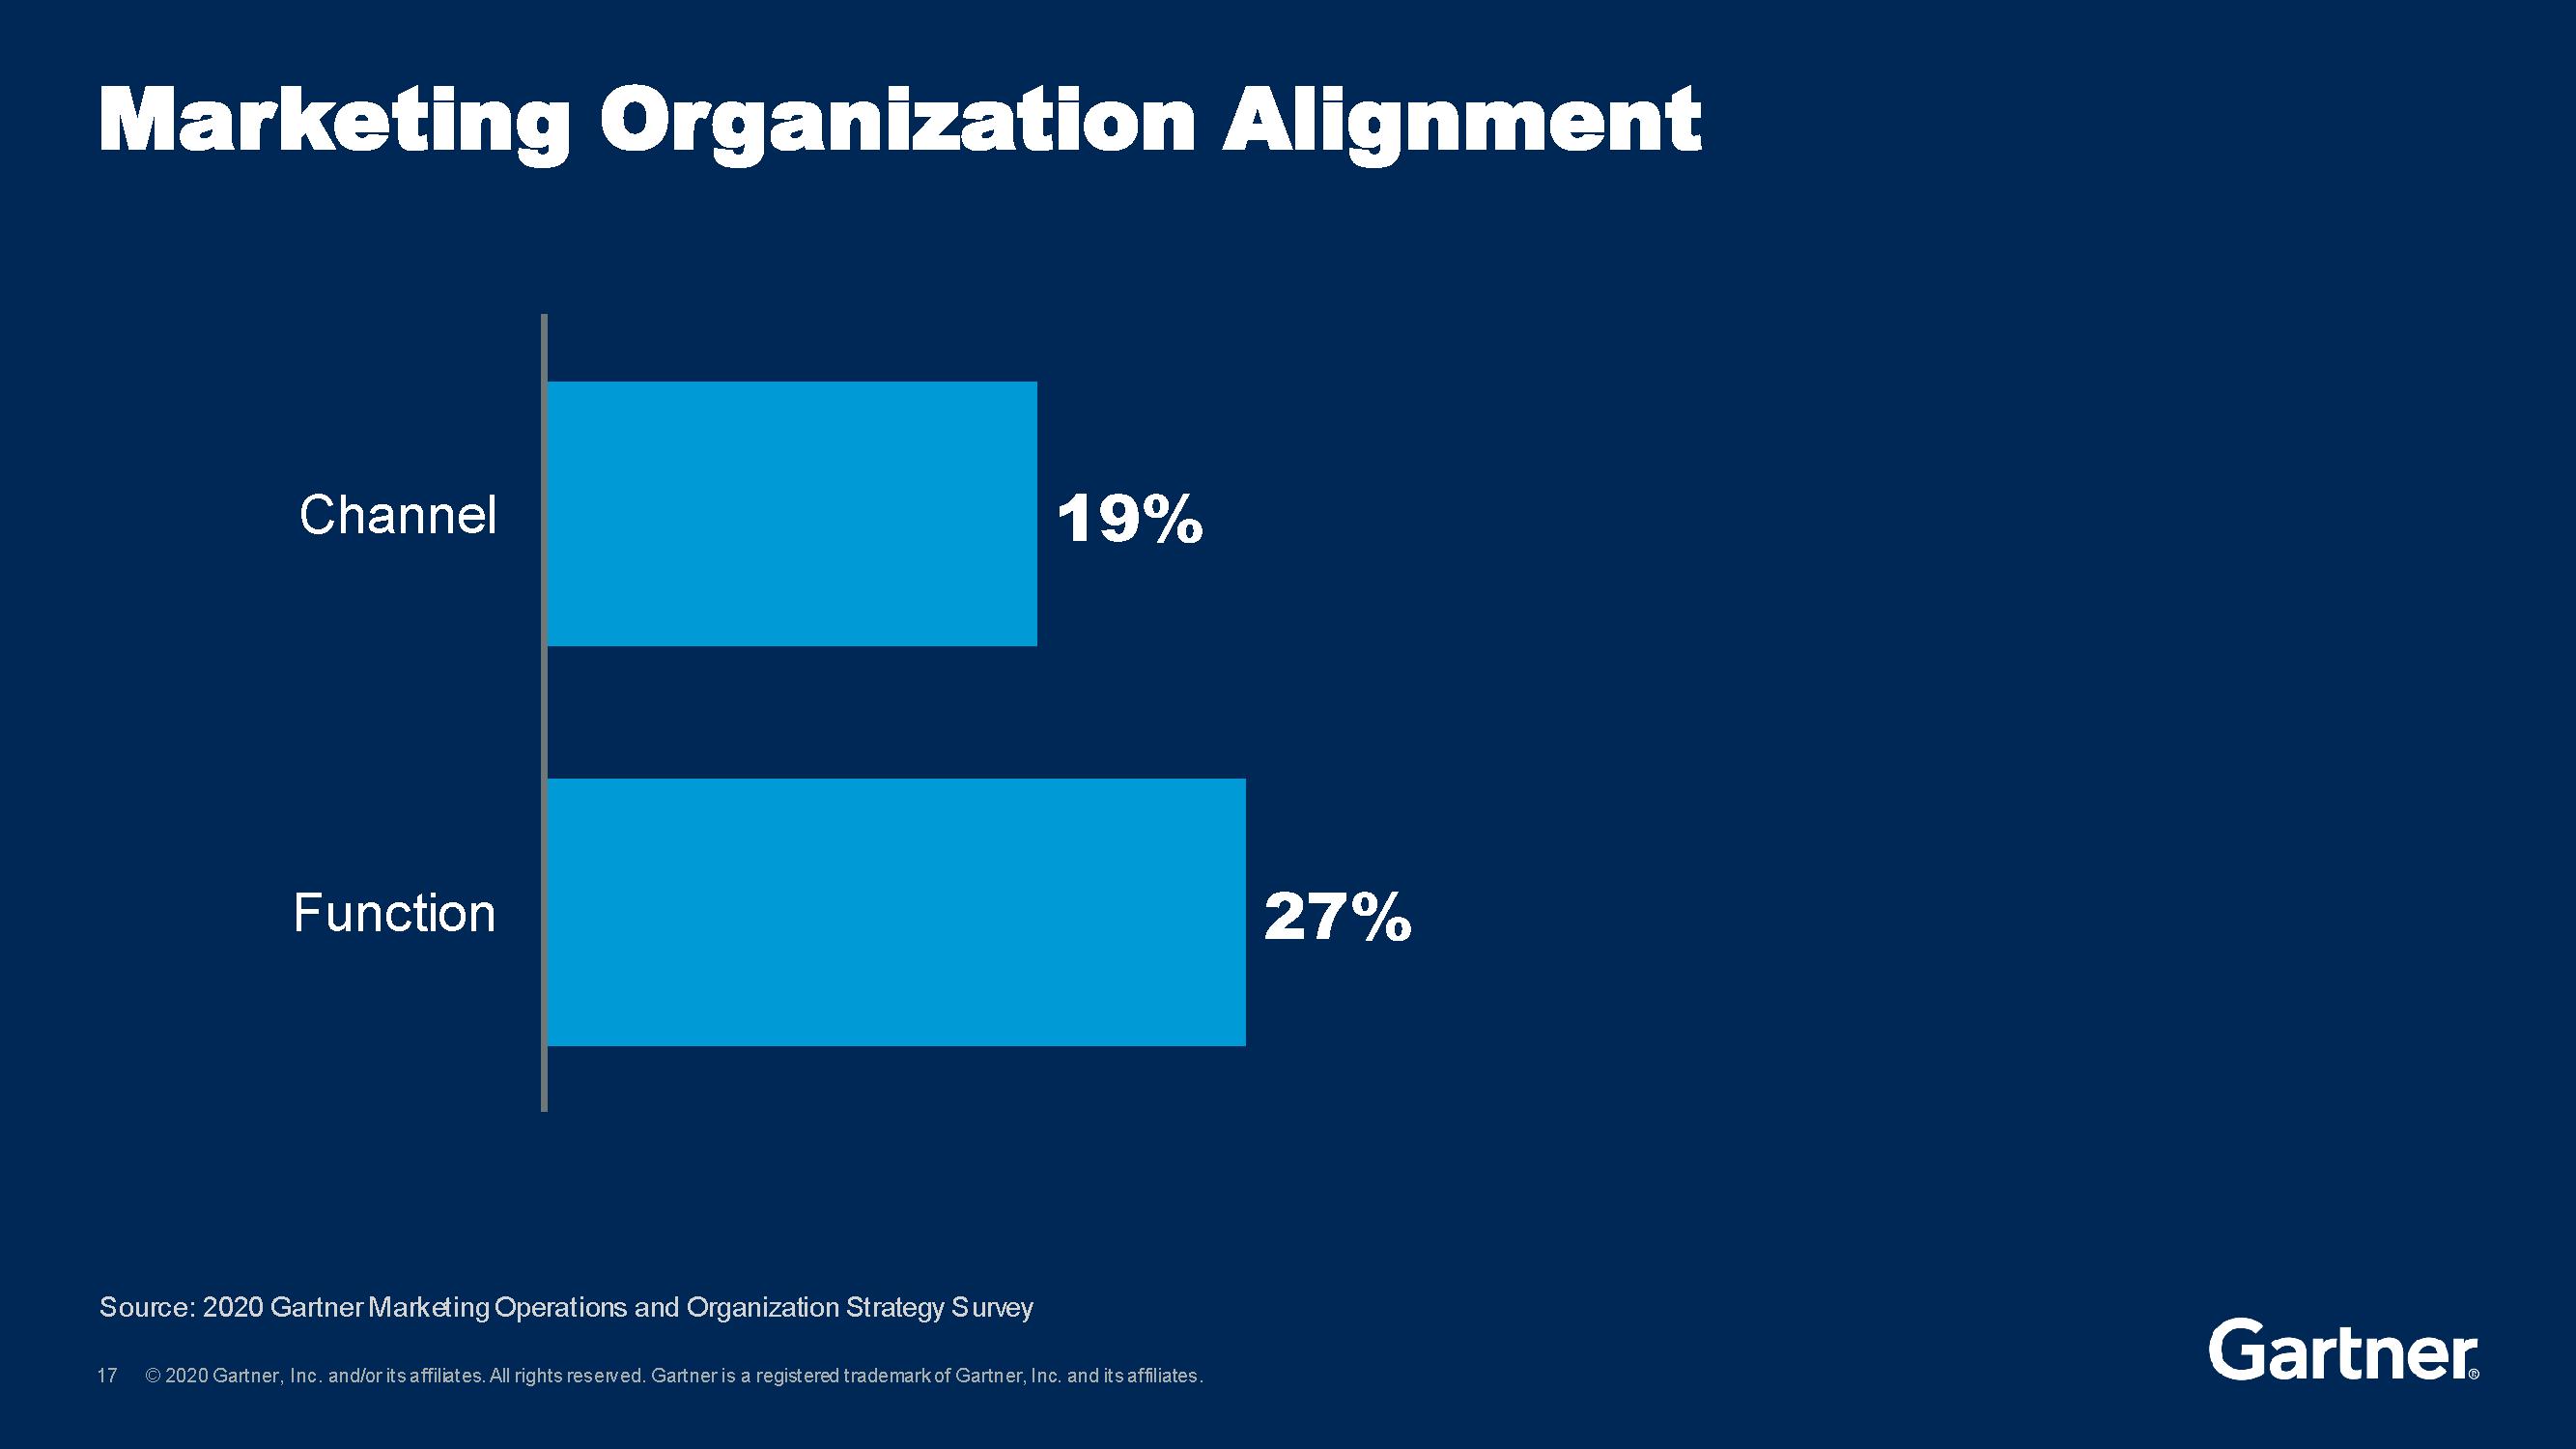 Gartner Marketing Organizational Alignment Chart